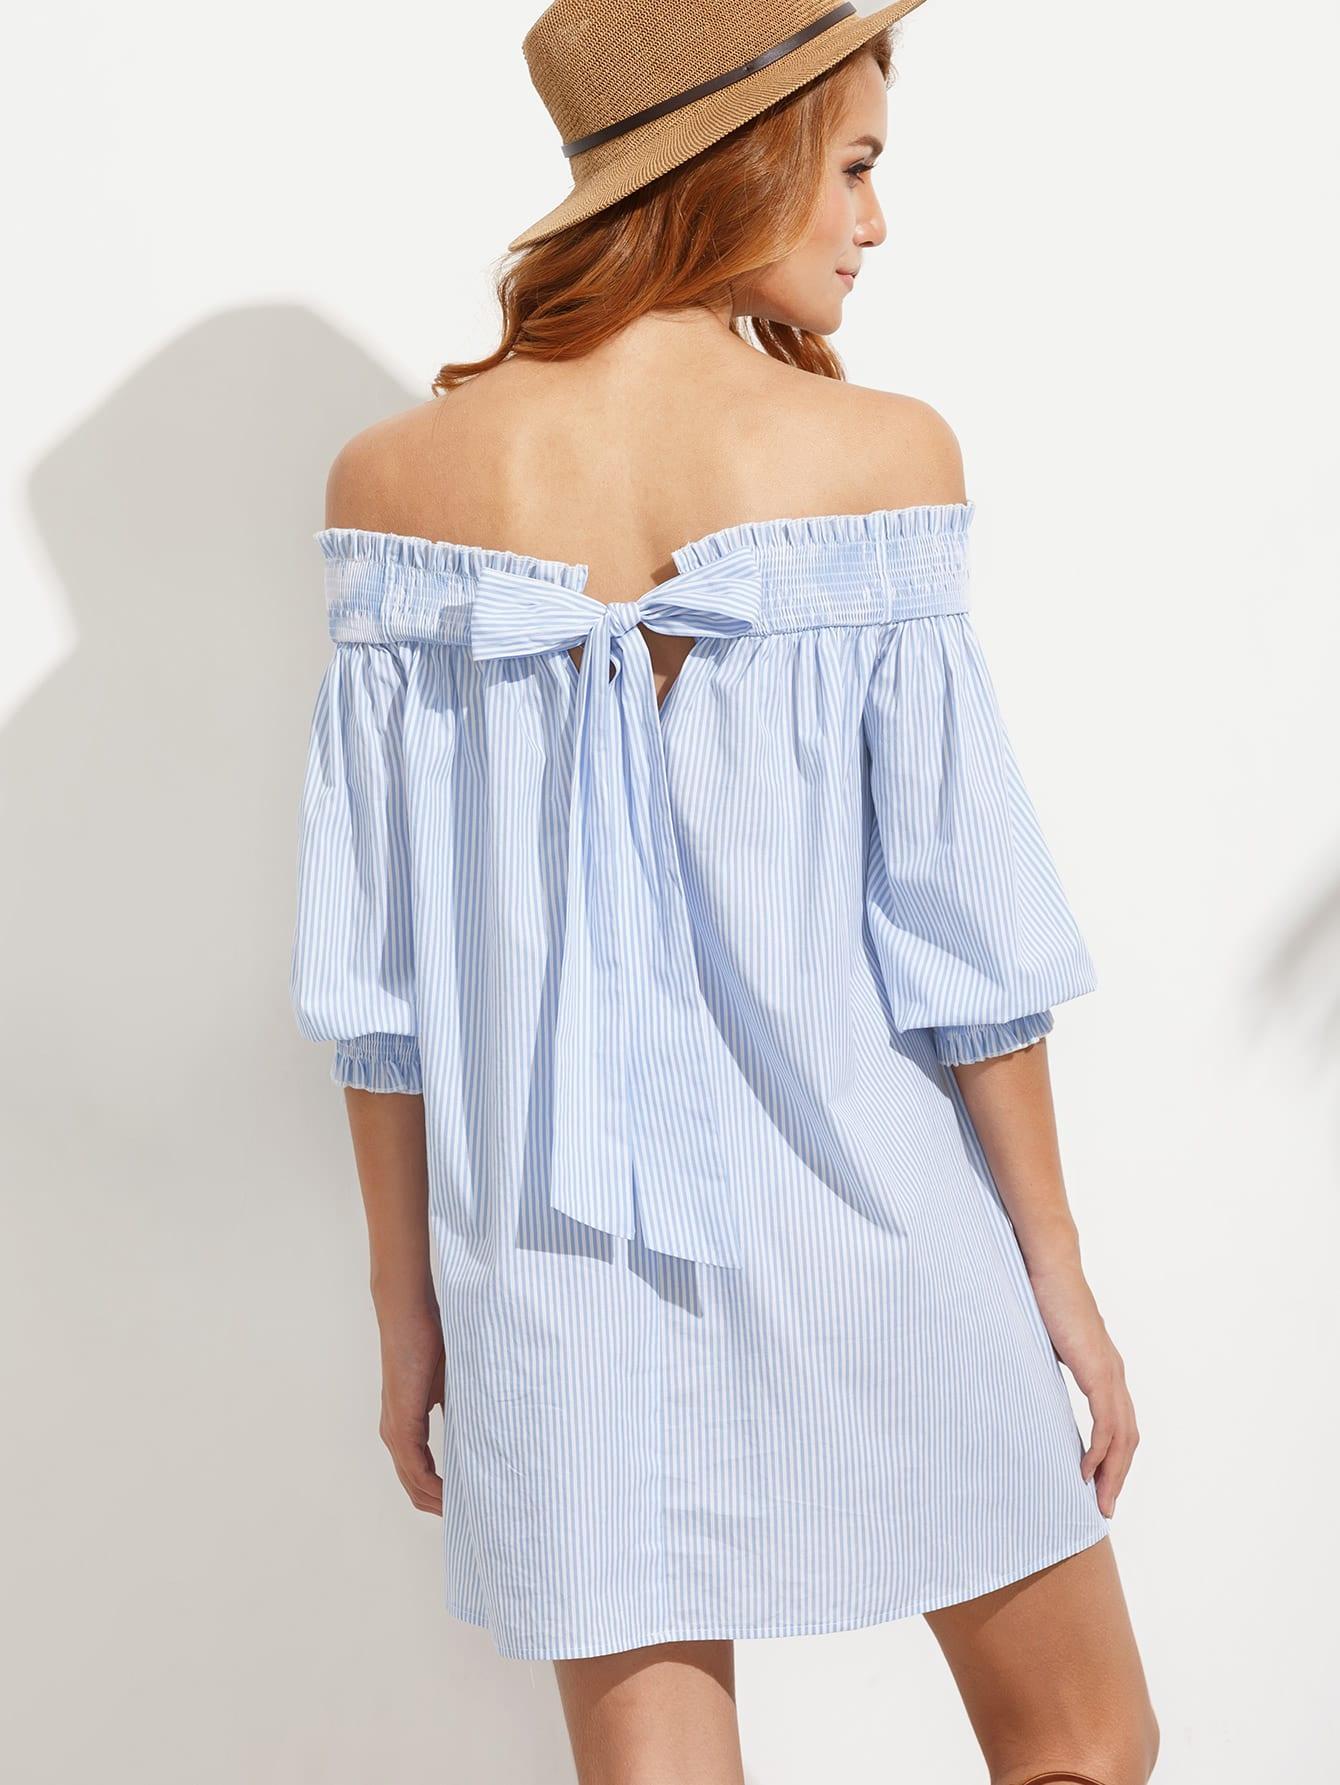 Bardot Bishop Sleeves Cutout Self Tie Back Swimg Dress dress160705711